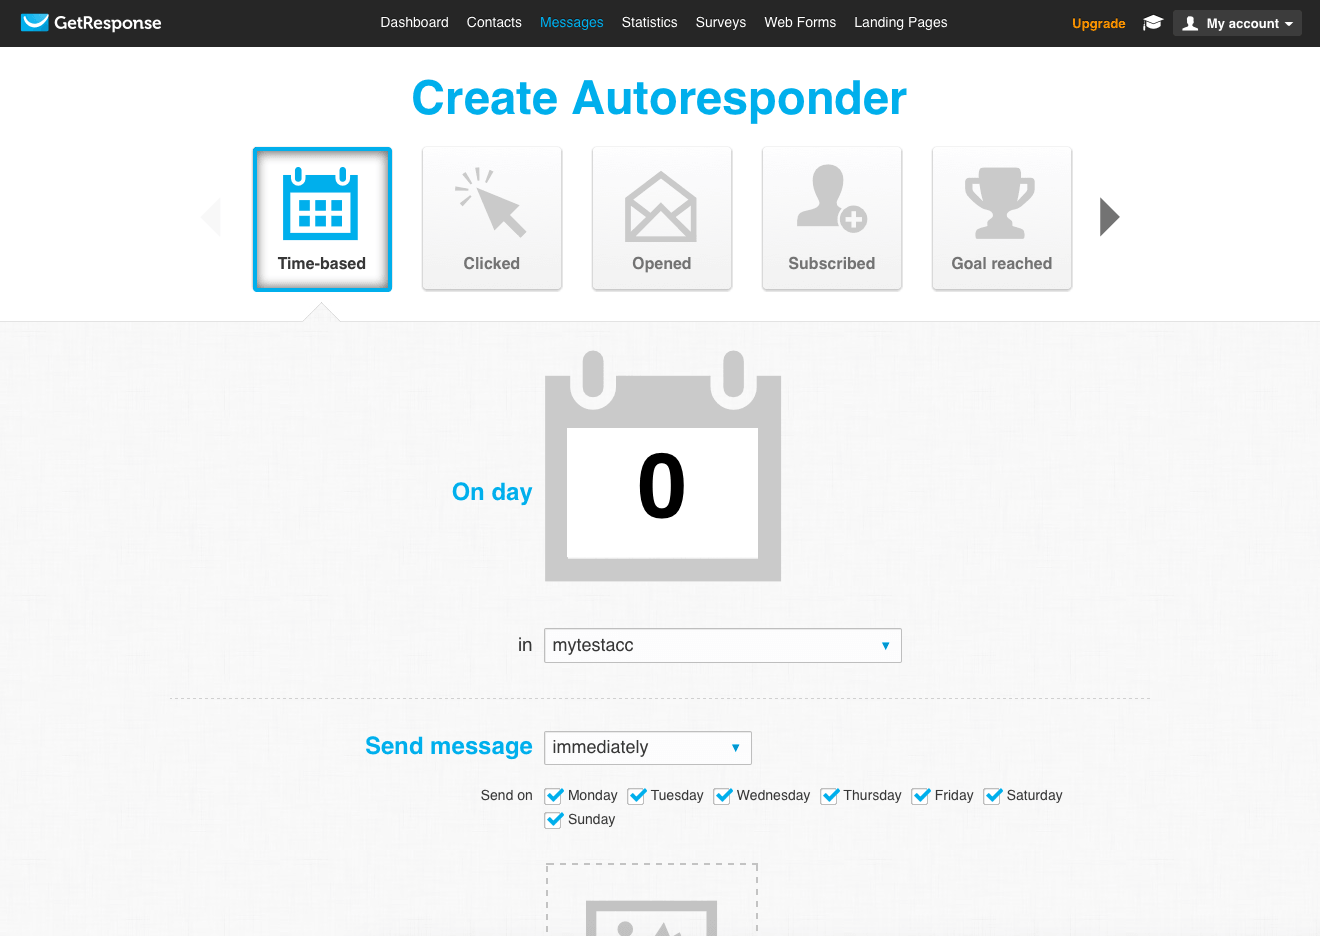 GetResponse_AutoResponder